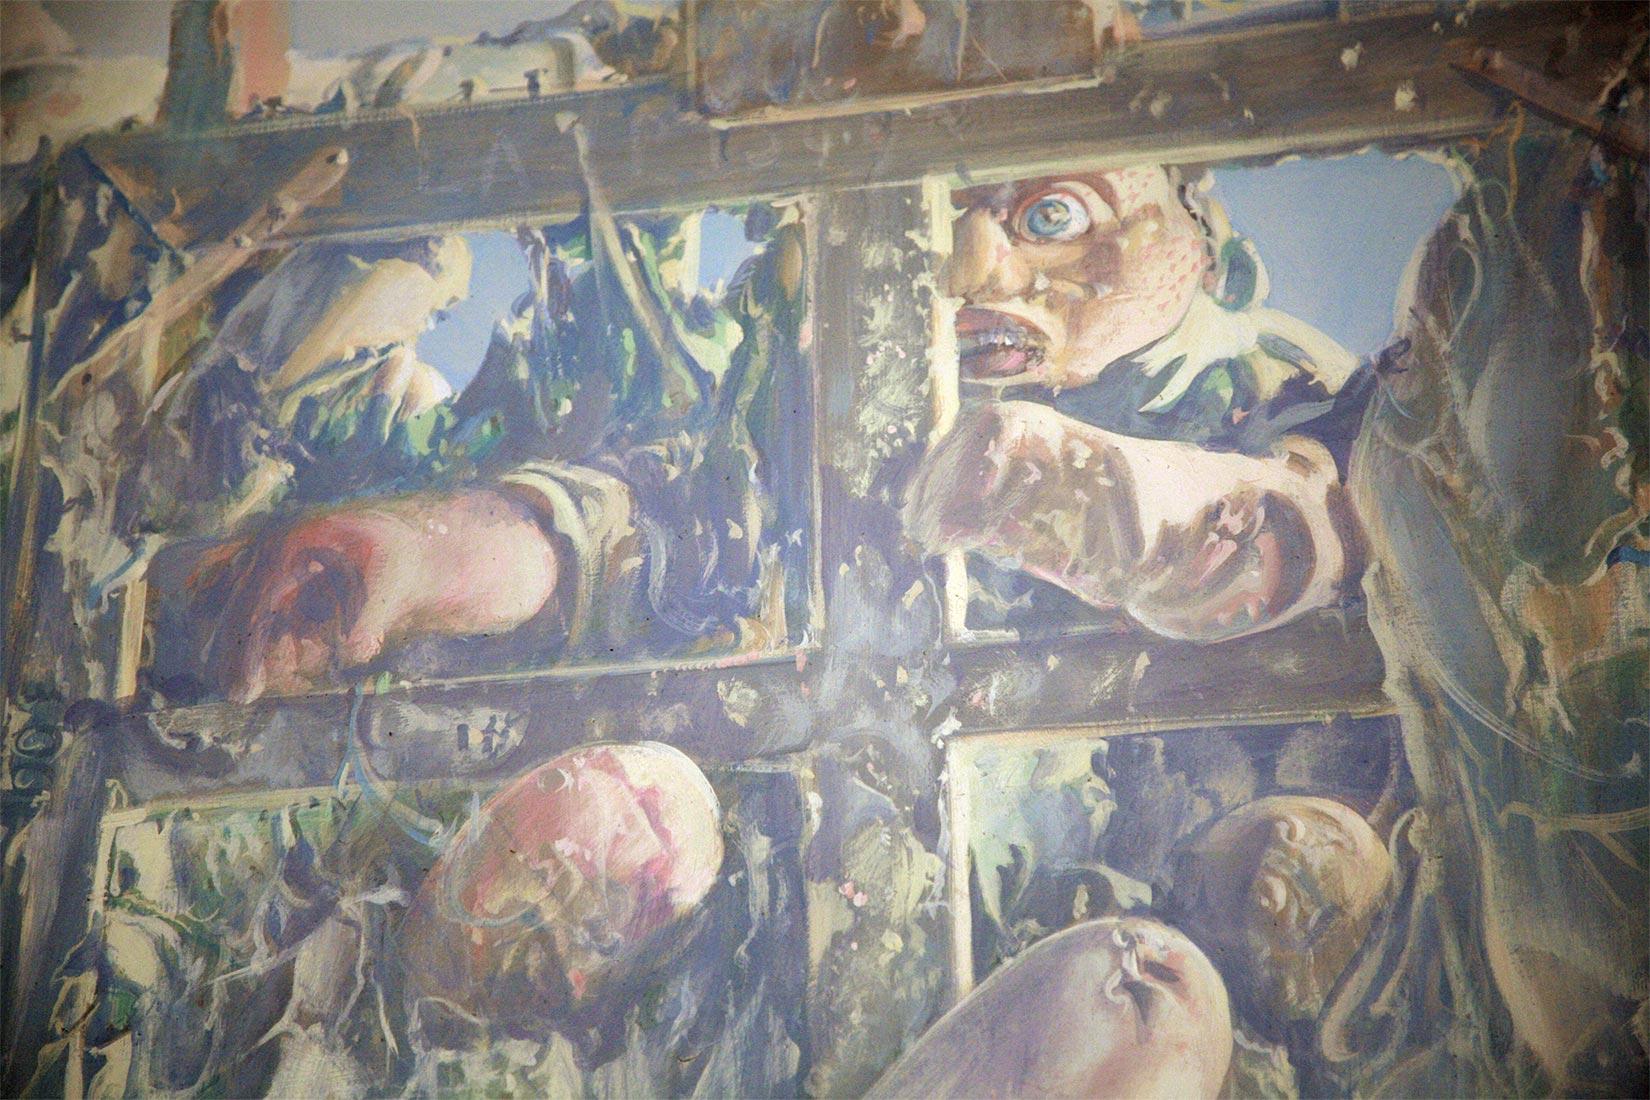 Dado's painting: The Studio, 1972 (detail)